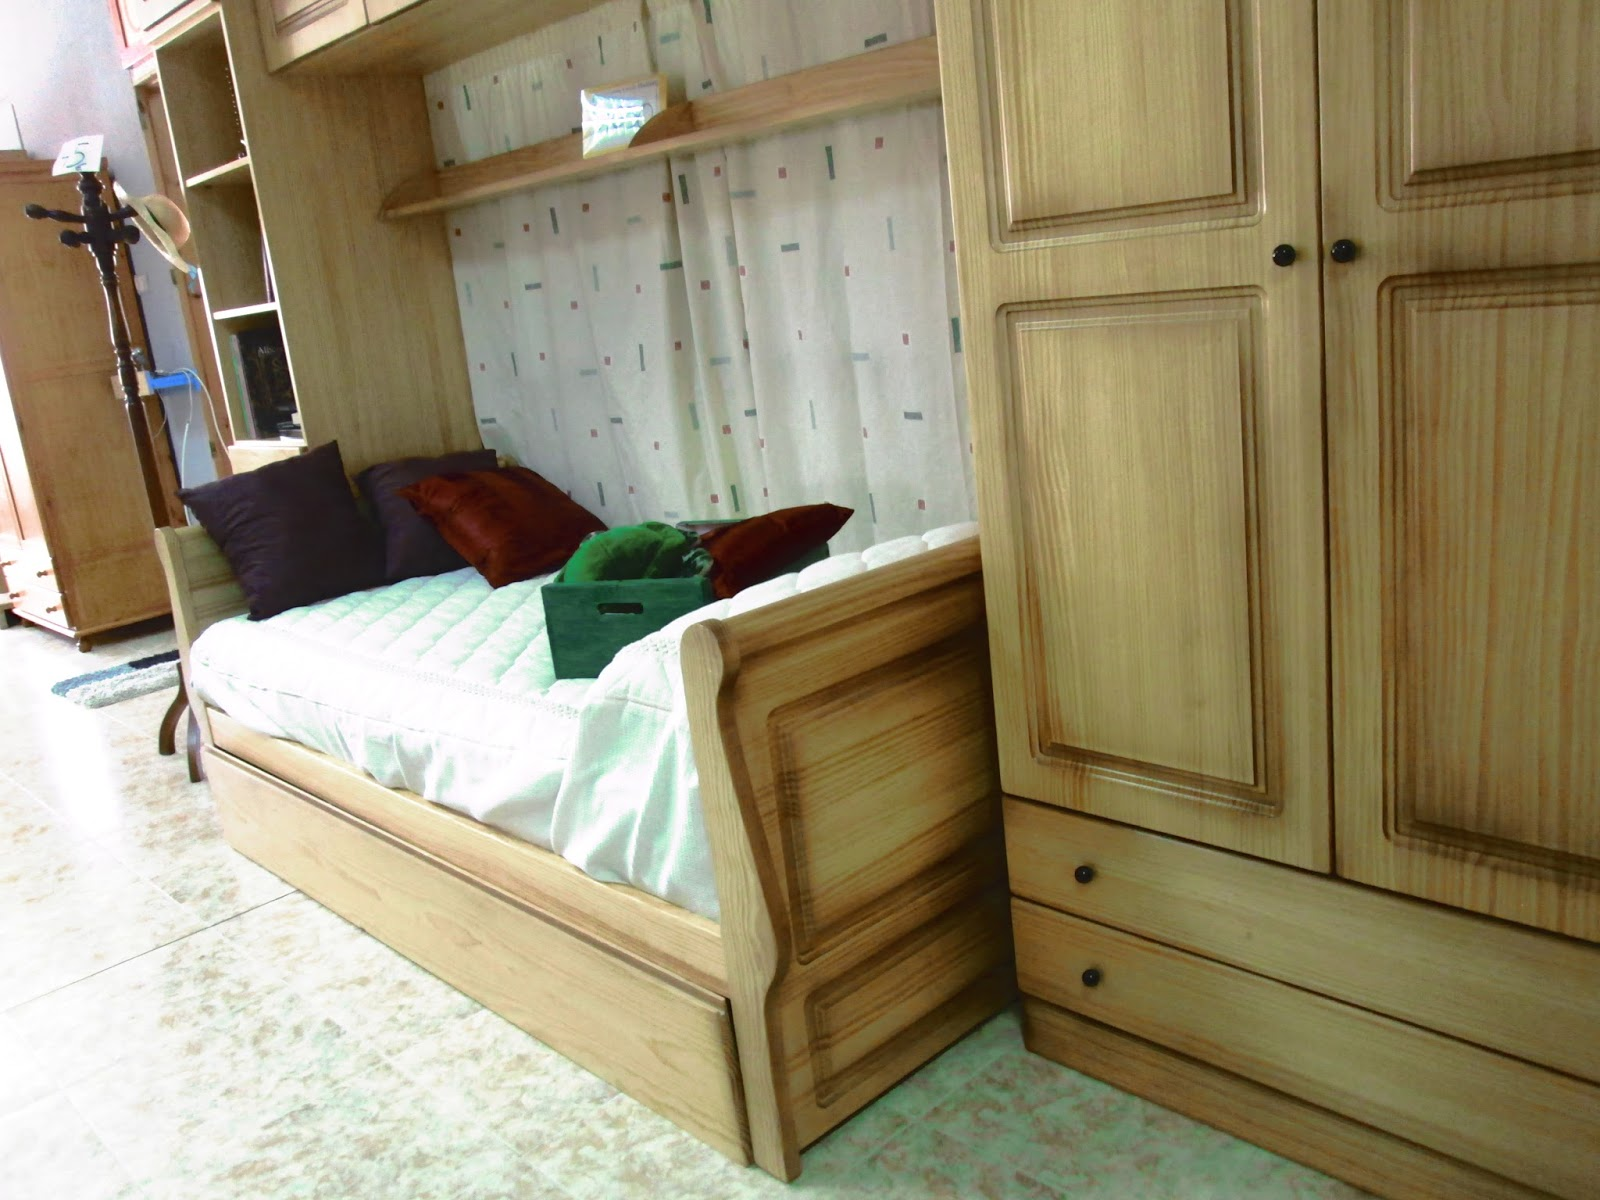 Muebles arcecoll dormitorios juveniles a medida for Dormitorios juveniles a medida